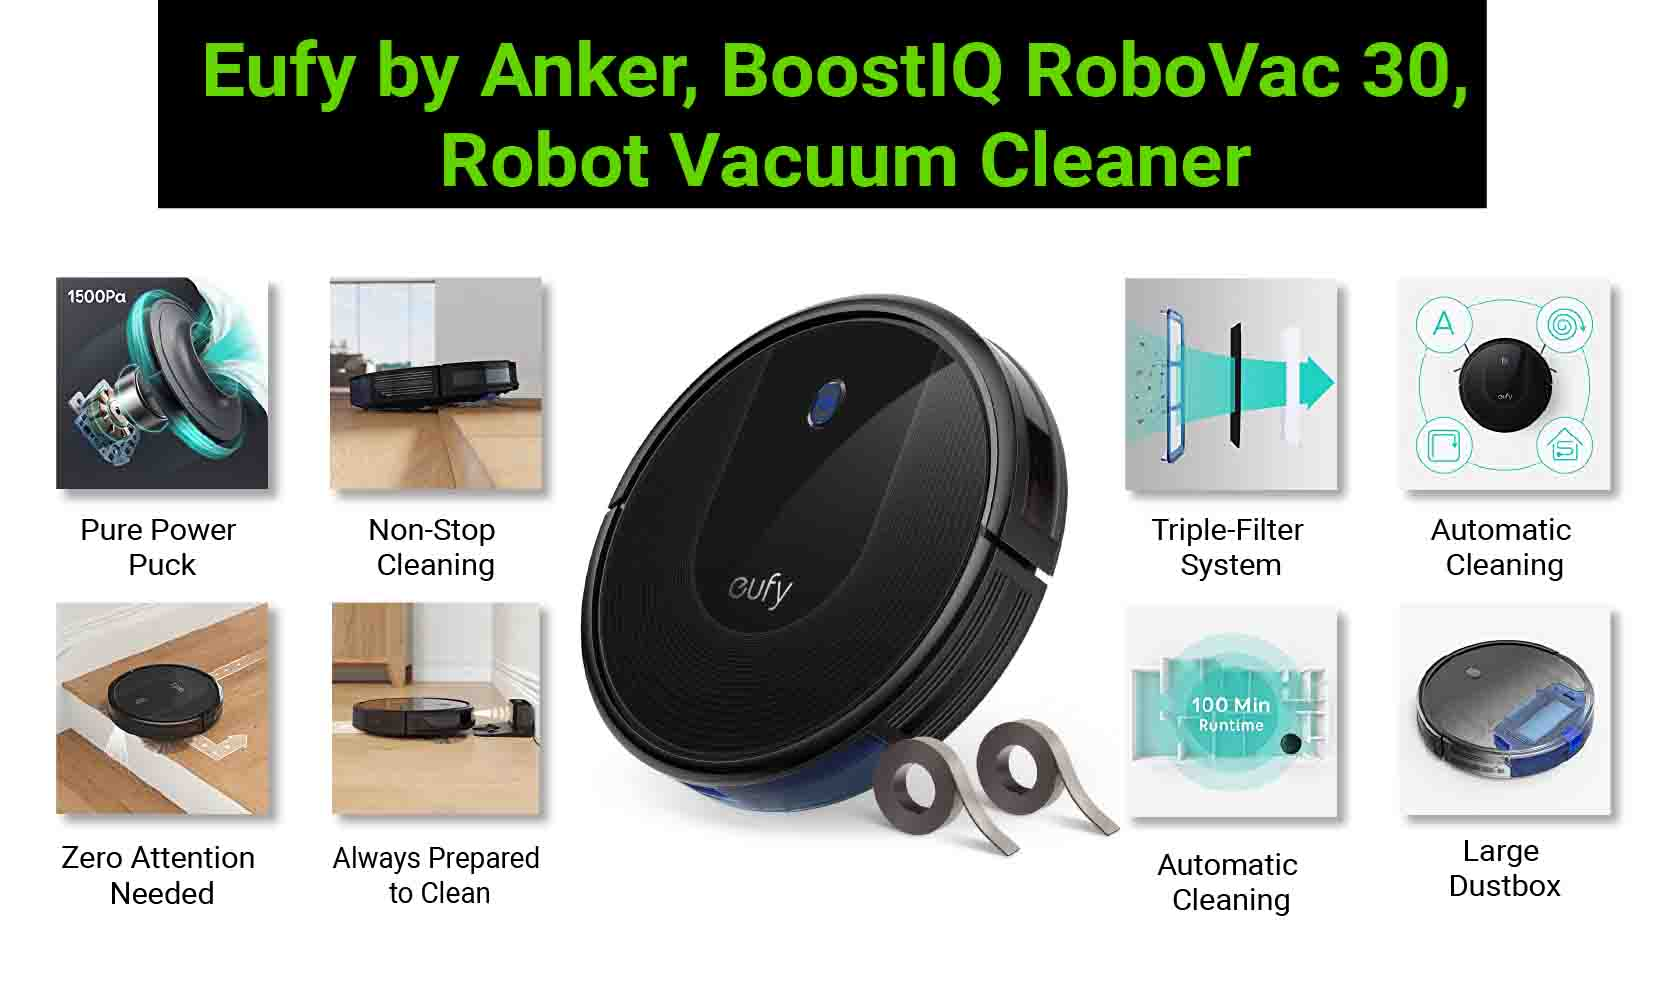 Eufy BoostIQ RoboVac 30 features